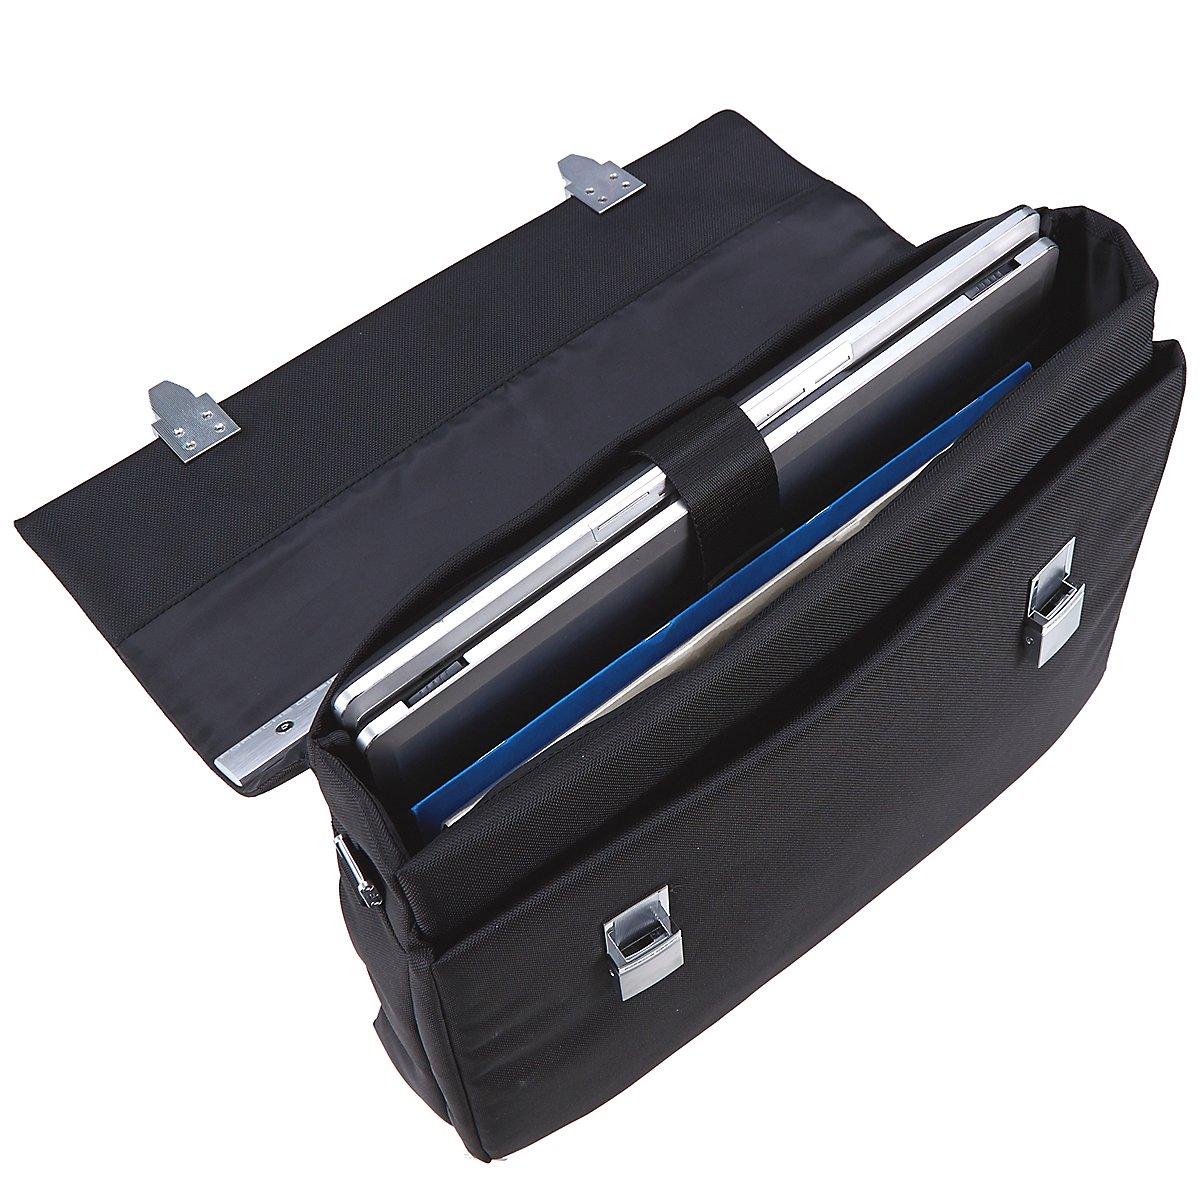 porsche design roadster 3 0 briefbag fs aktentasche mit. Black Bedroom Furniture Sets. Home Design Ideas